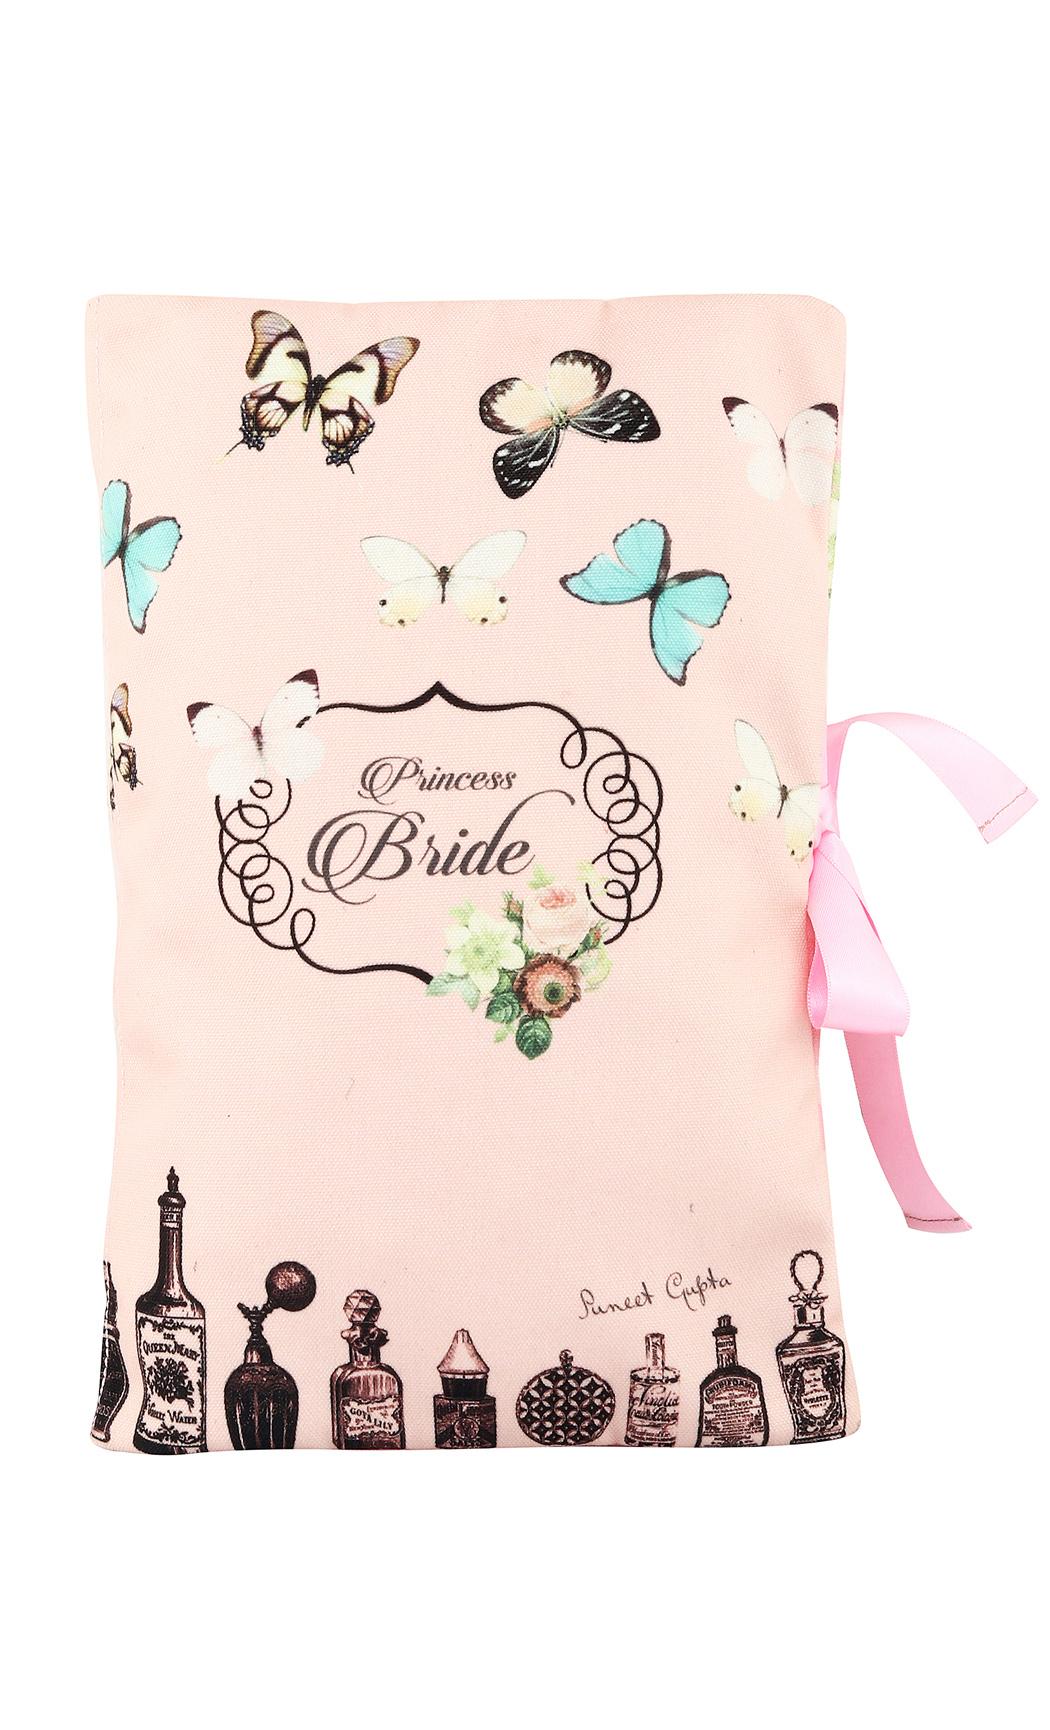 Princess Bride Lingerie Bag